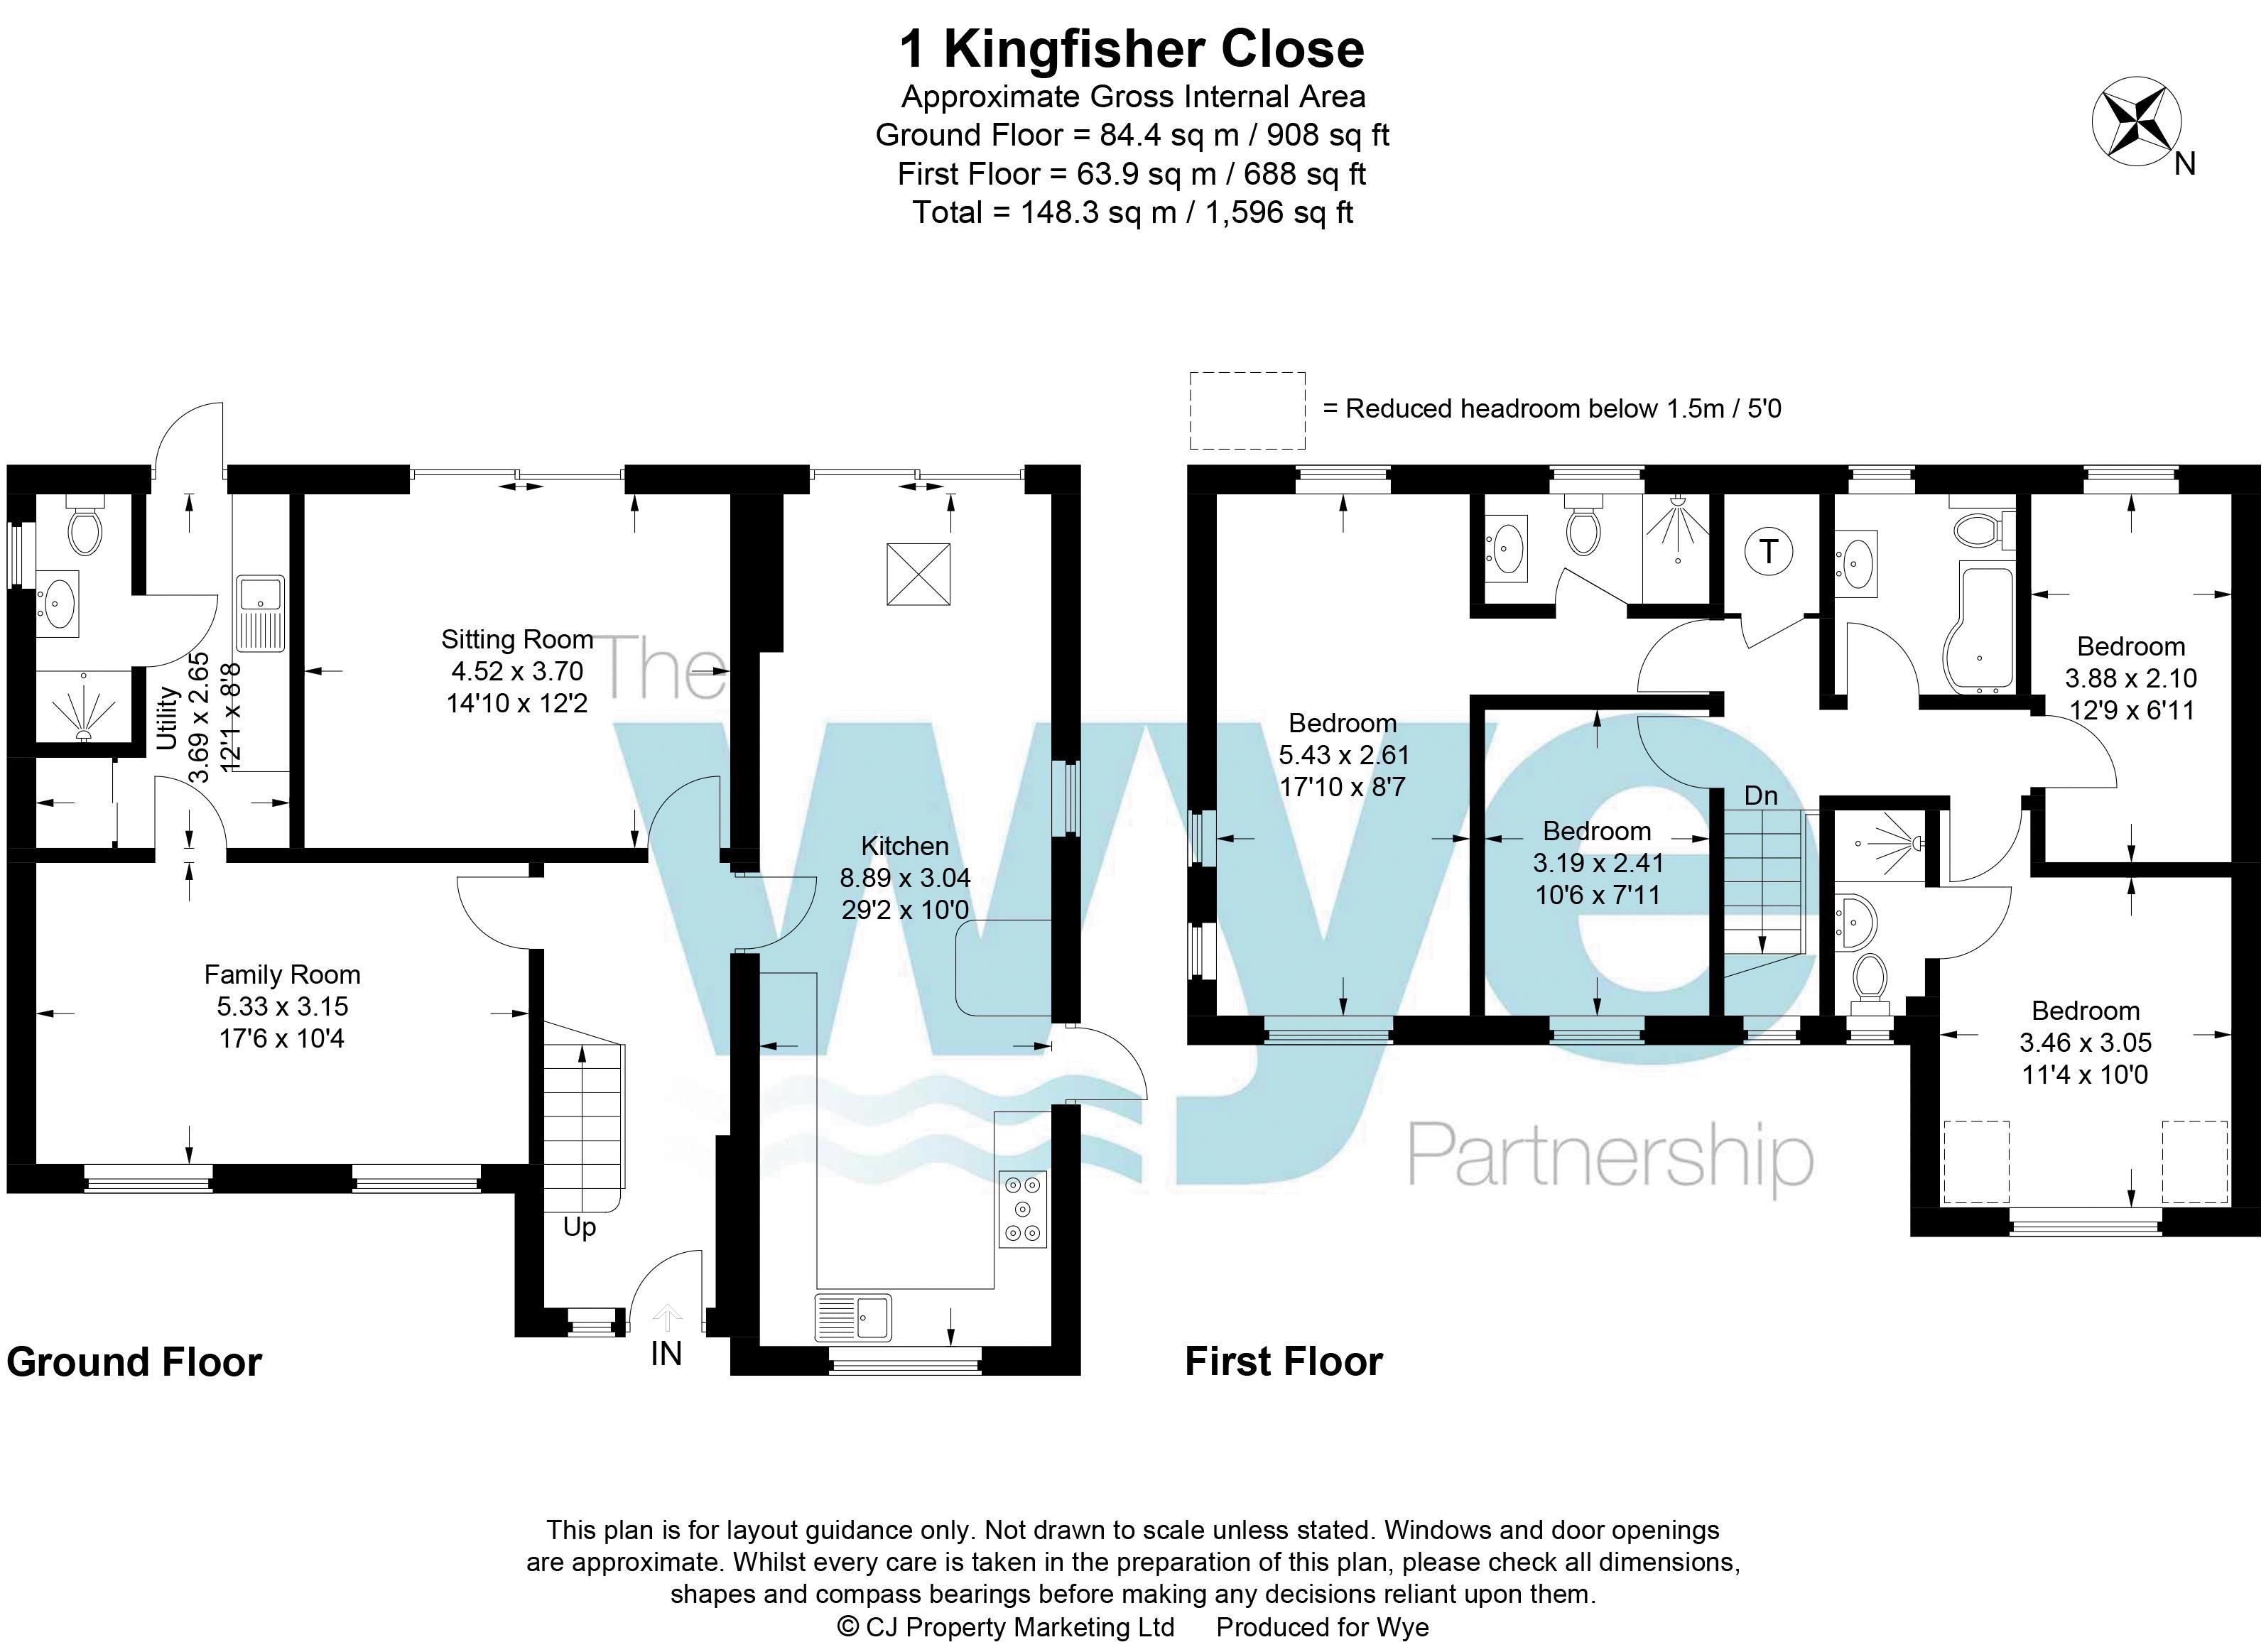 Kingfisher Close